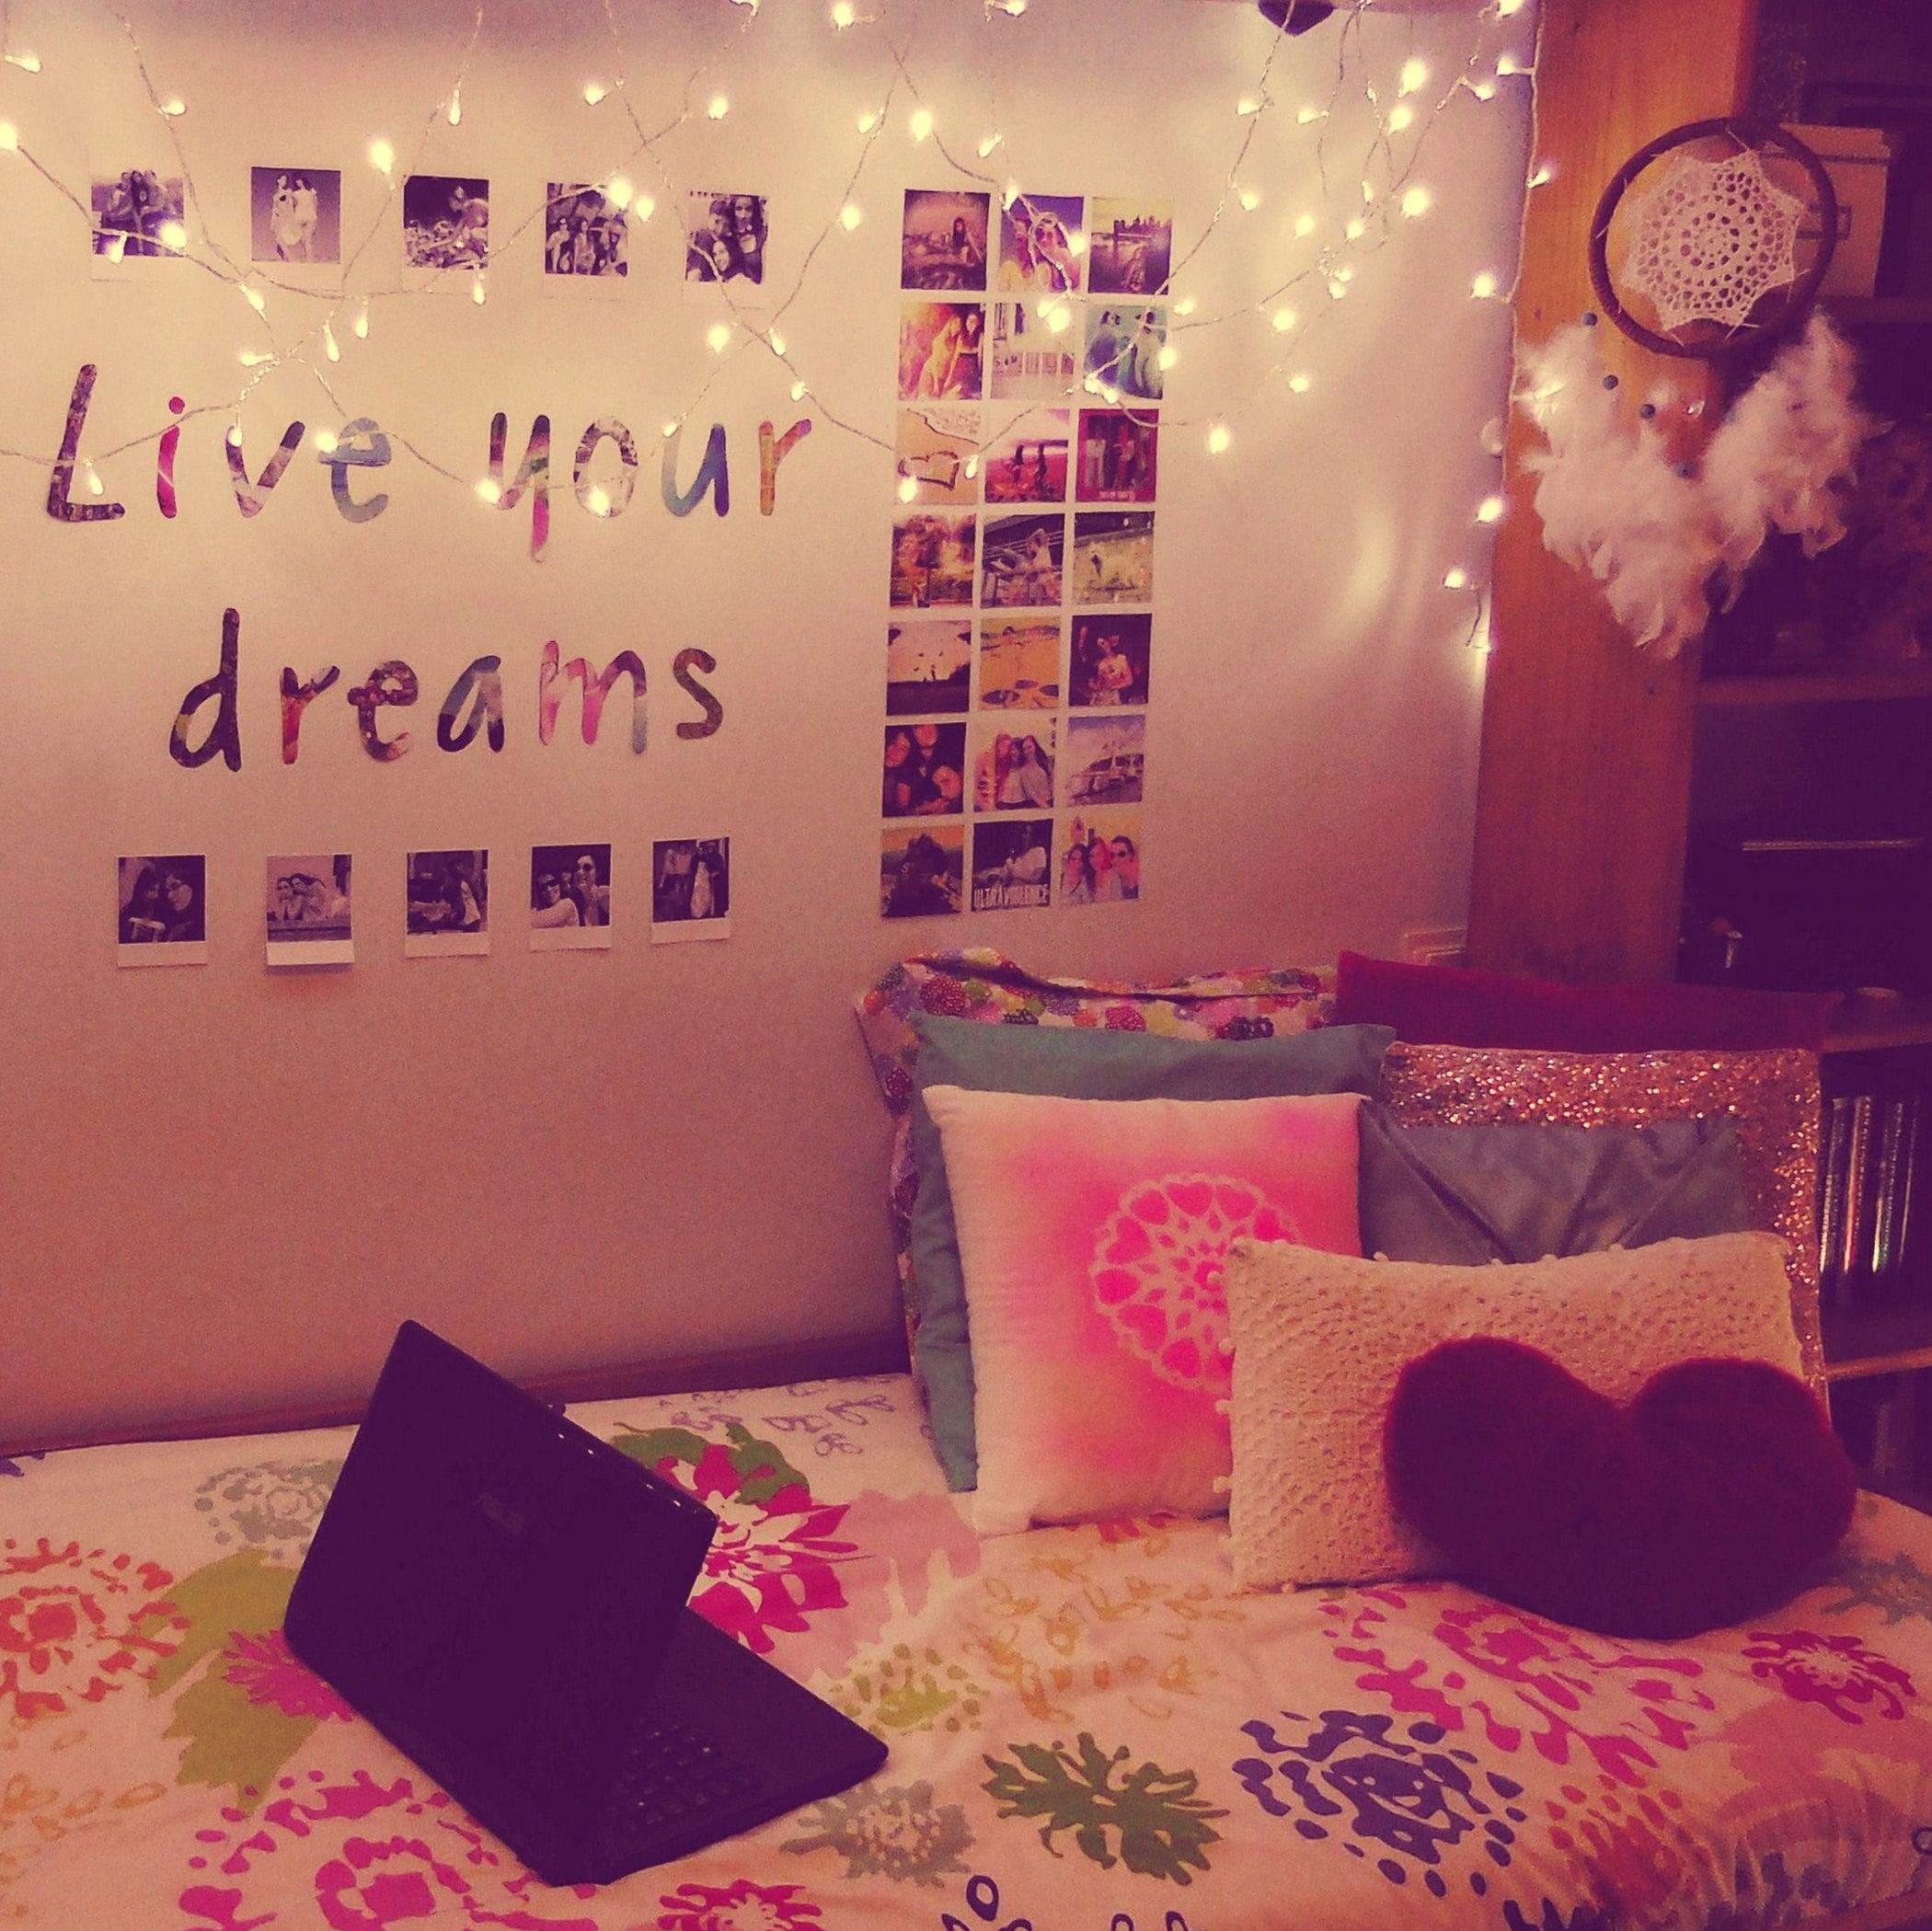 Room Decor: DIY Tumblr Inspired Room Decor Ideas! Easy & Fun